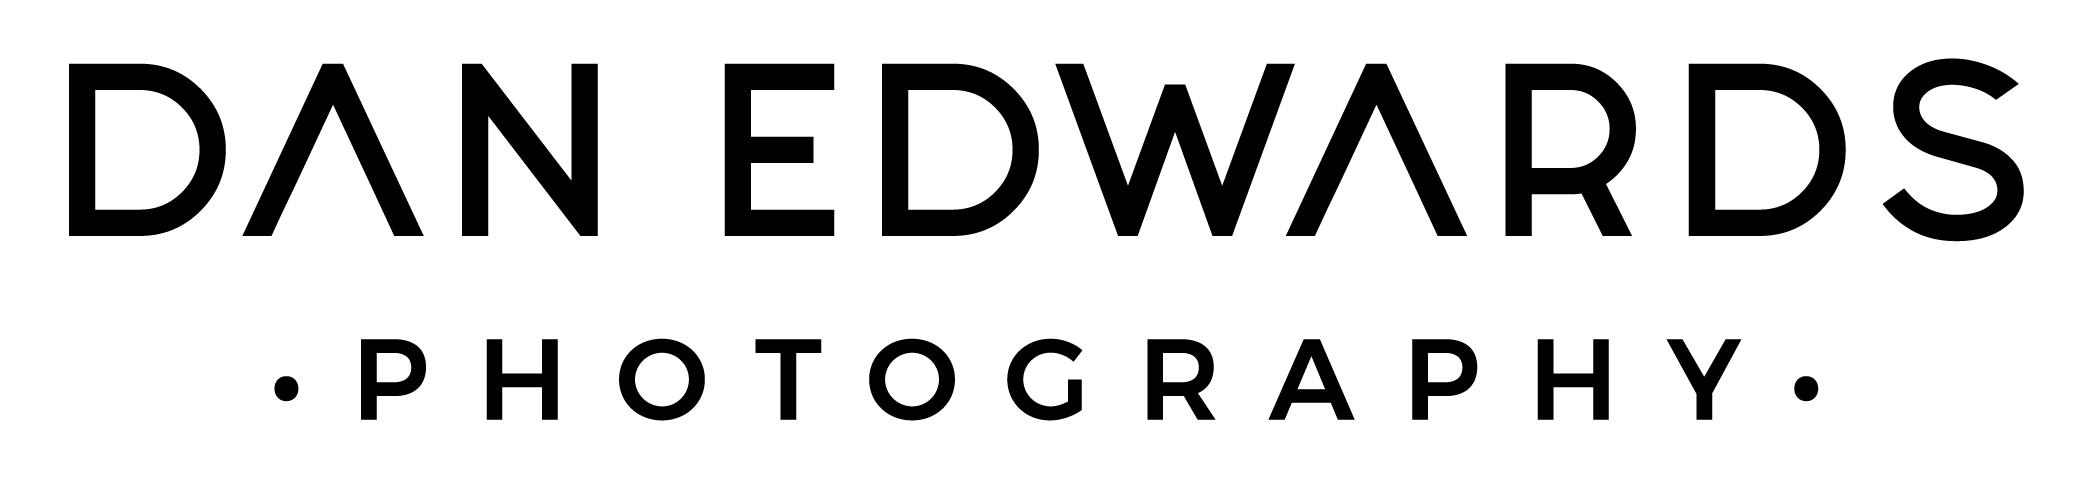 www.danedwardsphotography.com